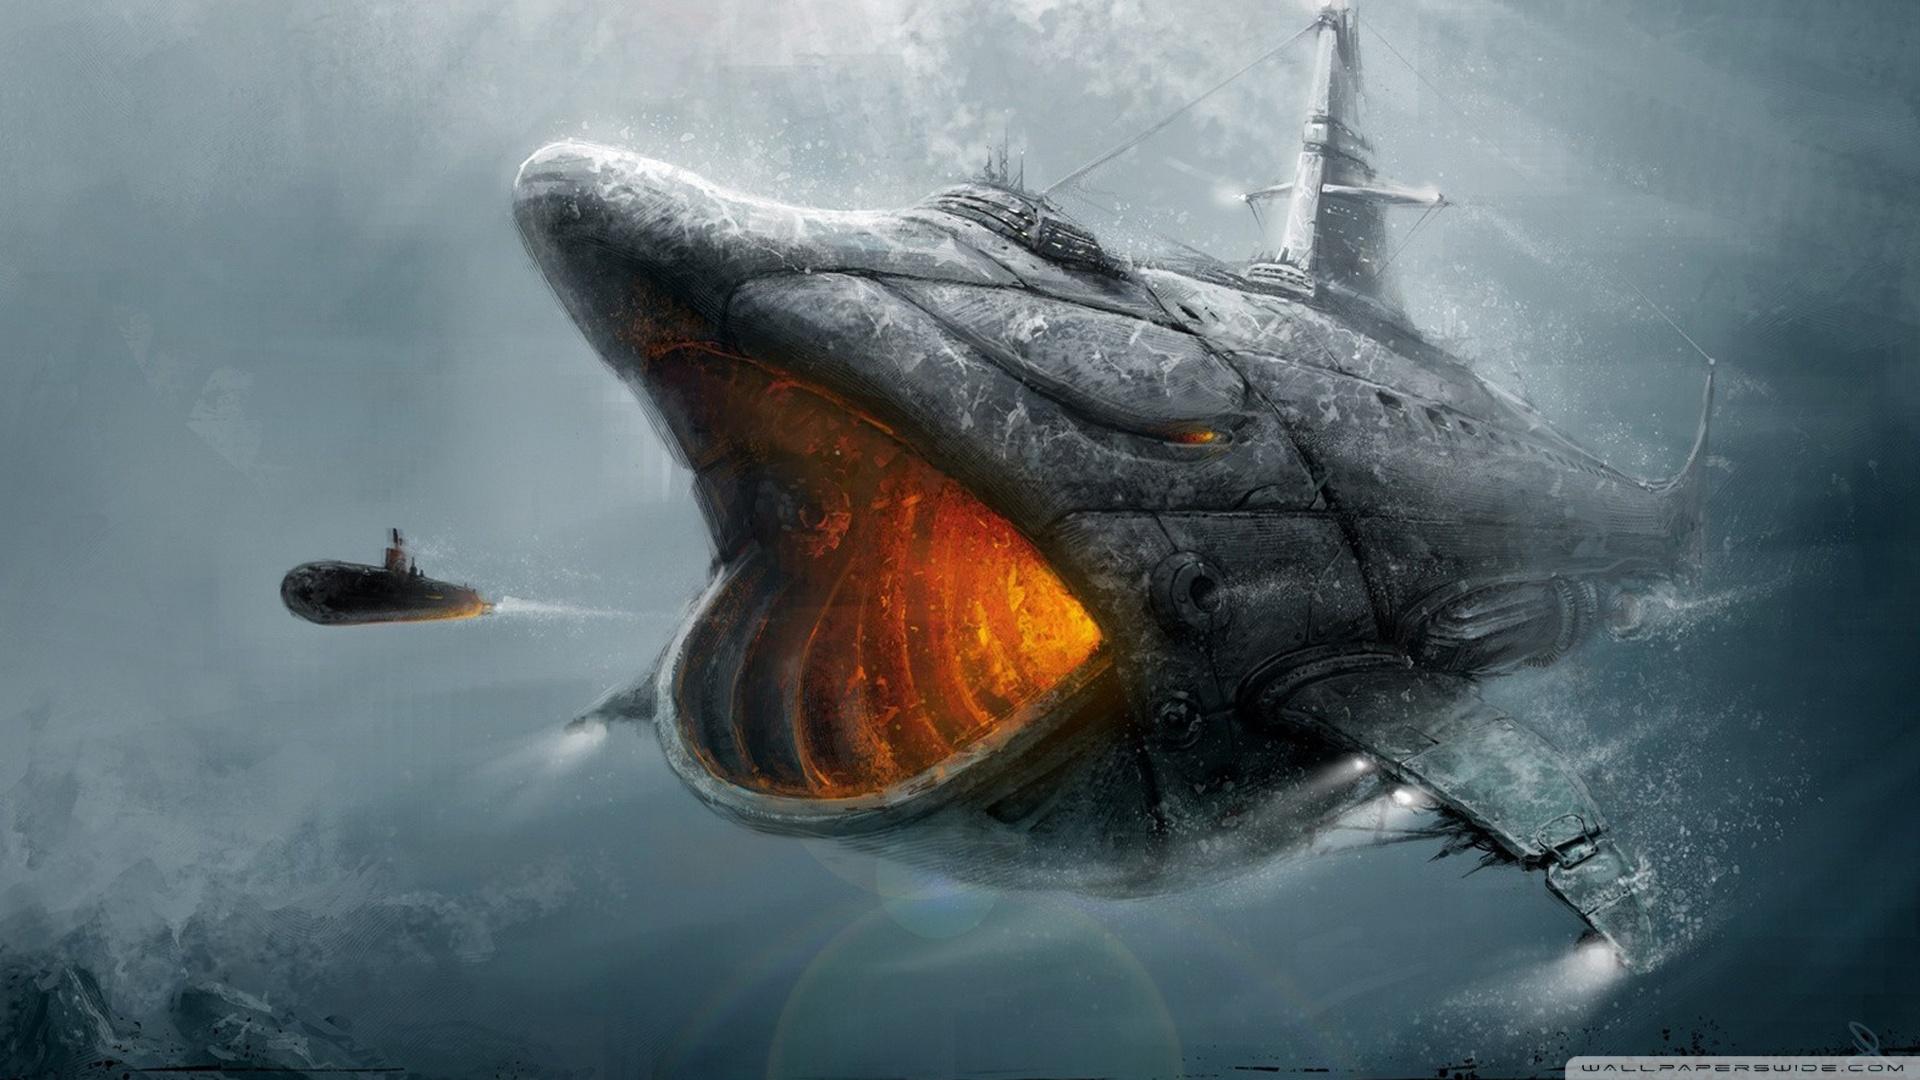 Nuclear Submarine Wallpaper Fish Submarine Wallpaper 1920x1080